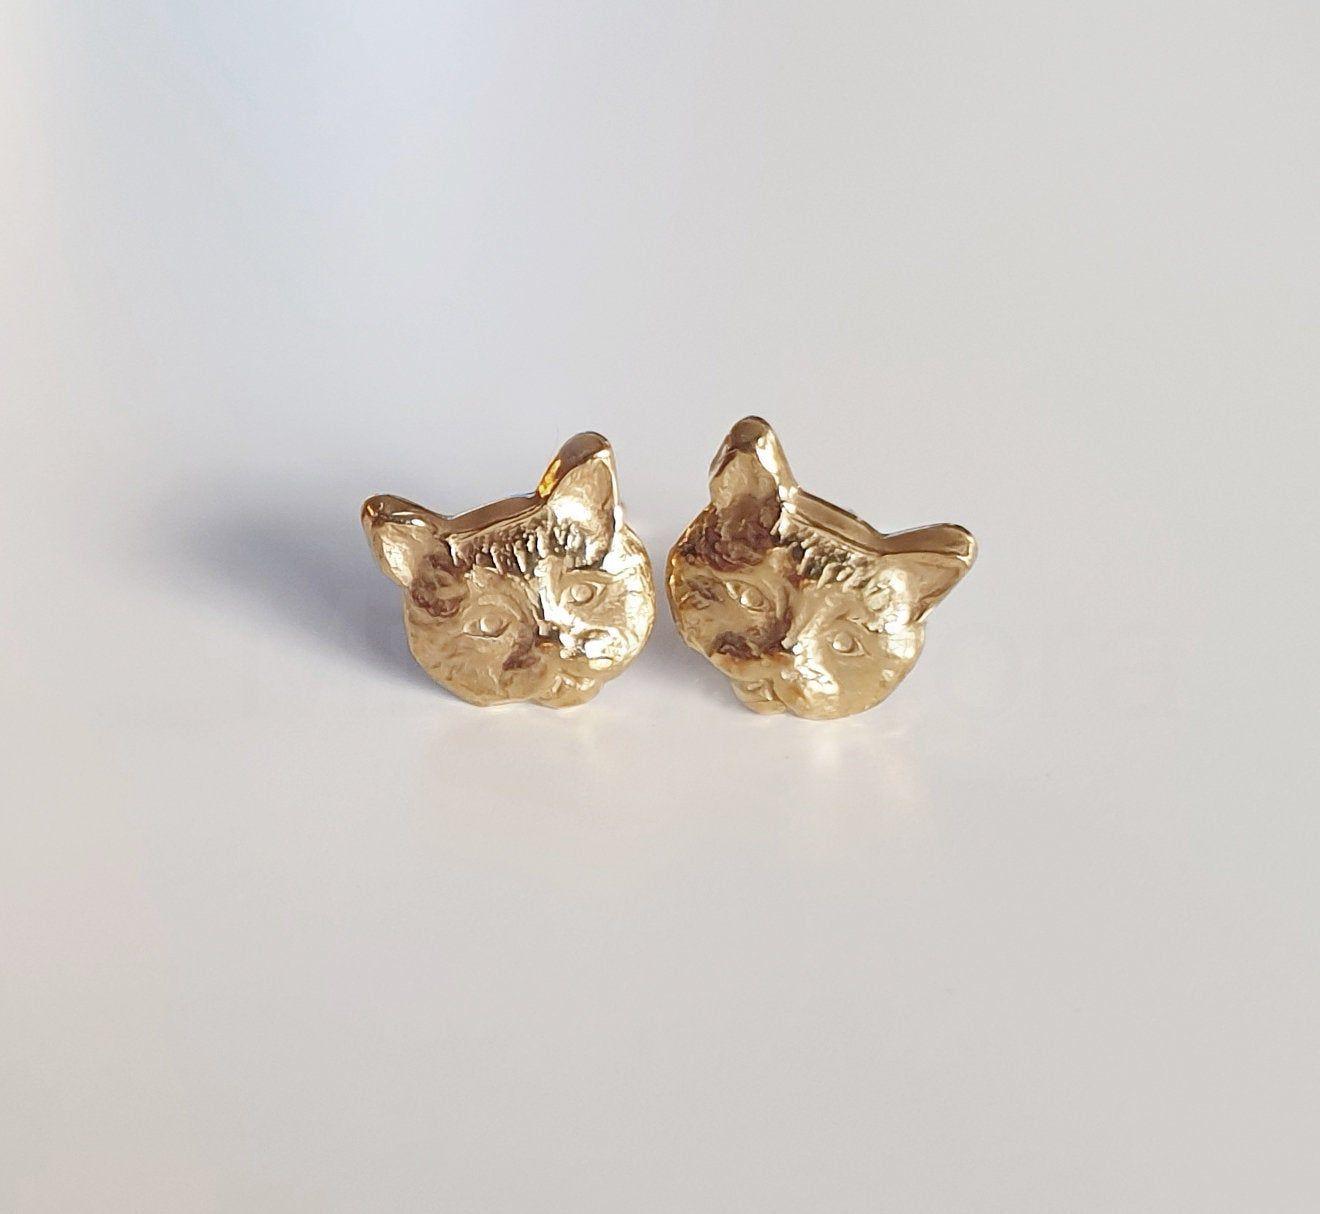 Animal jewellery Dainty cat pendant Cute cat necklace and earrings. Cat jewellery Cat necklace and earring set